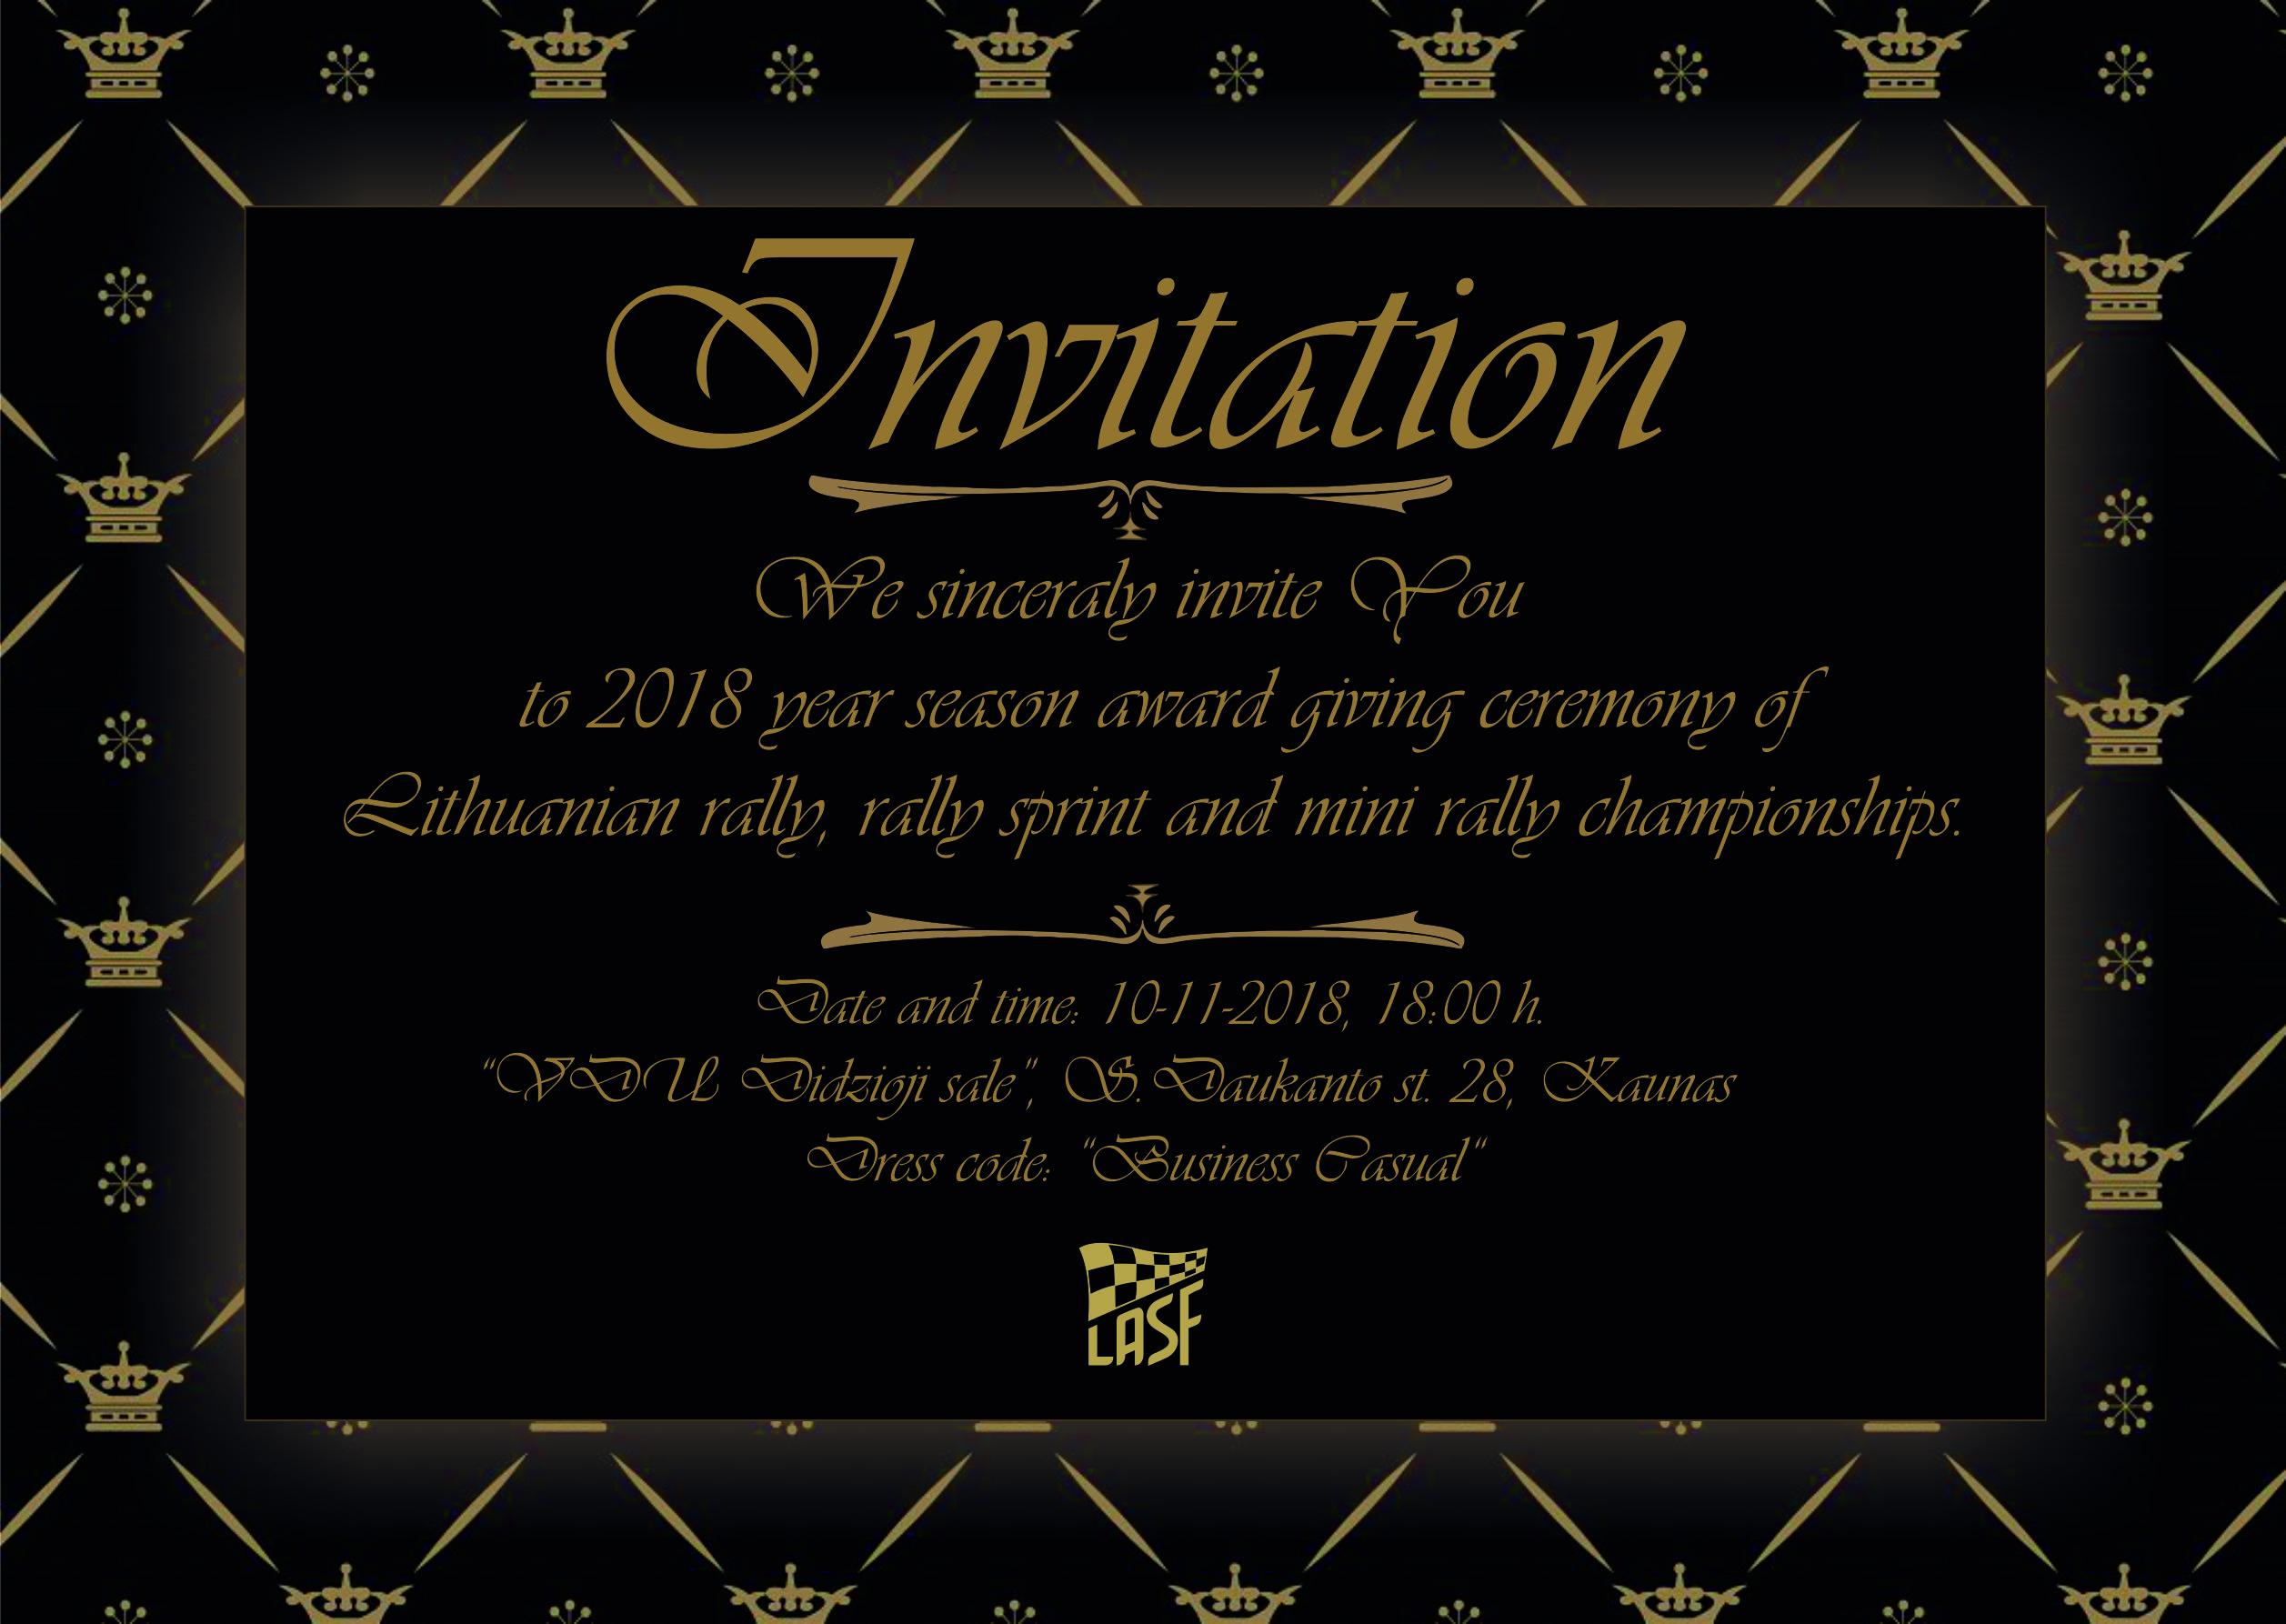 invitation en cmyk